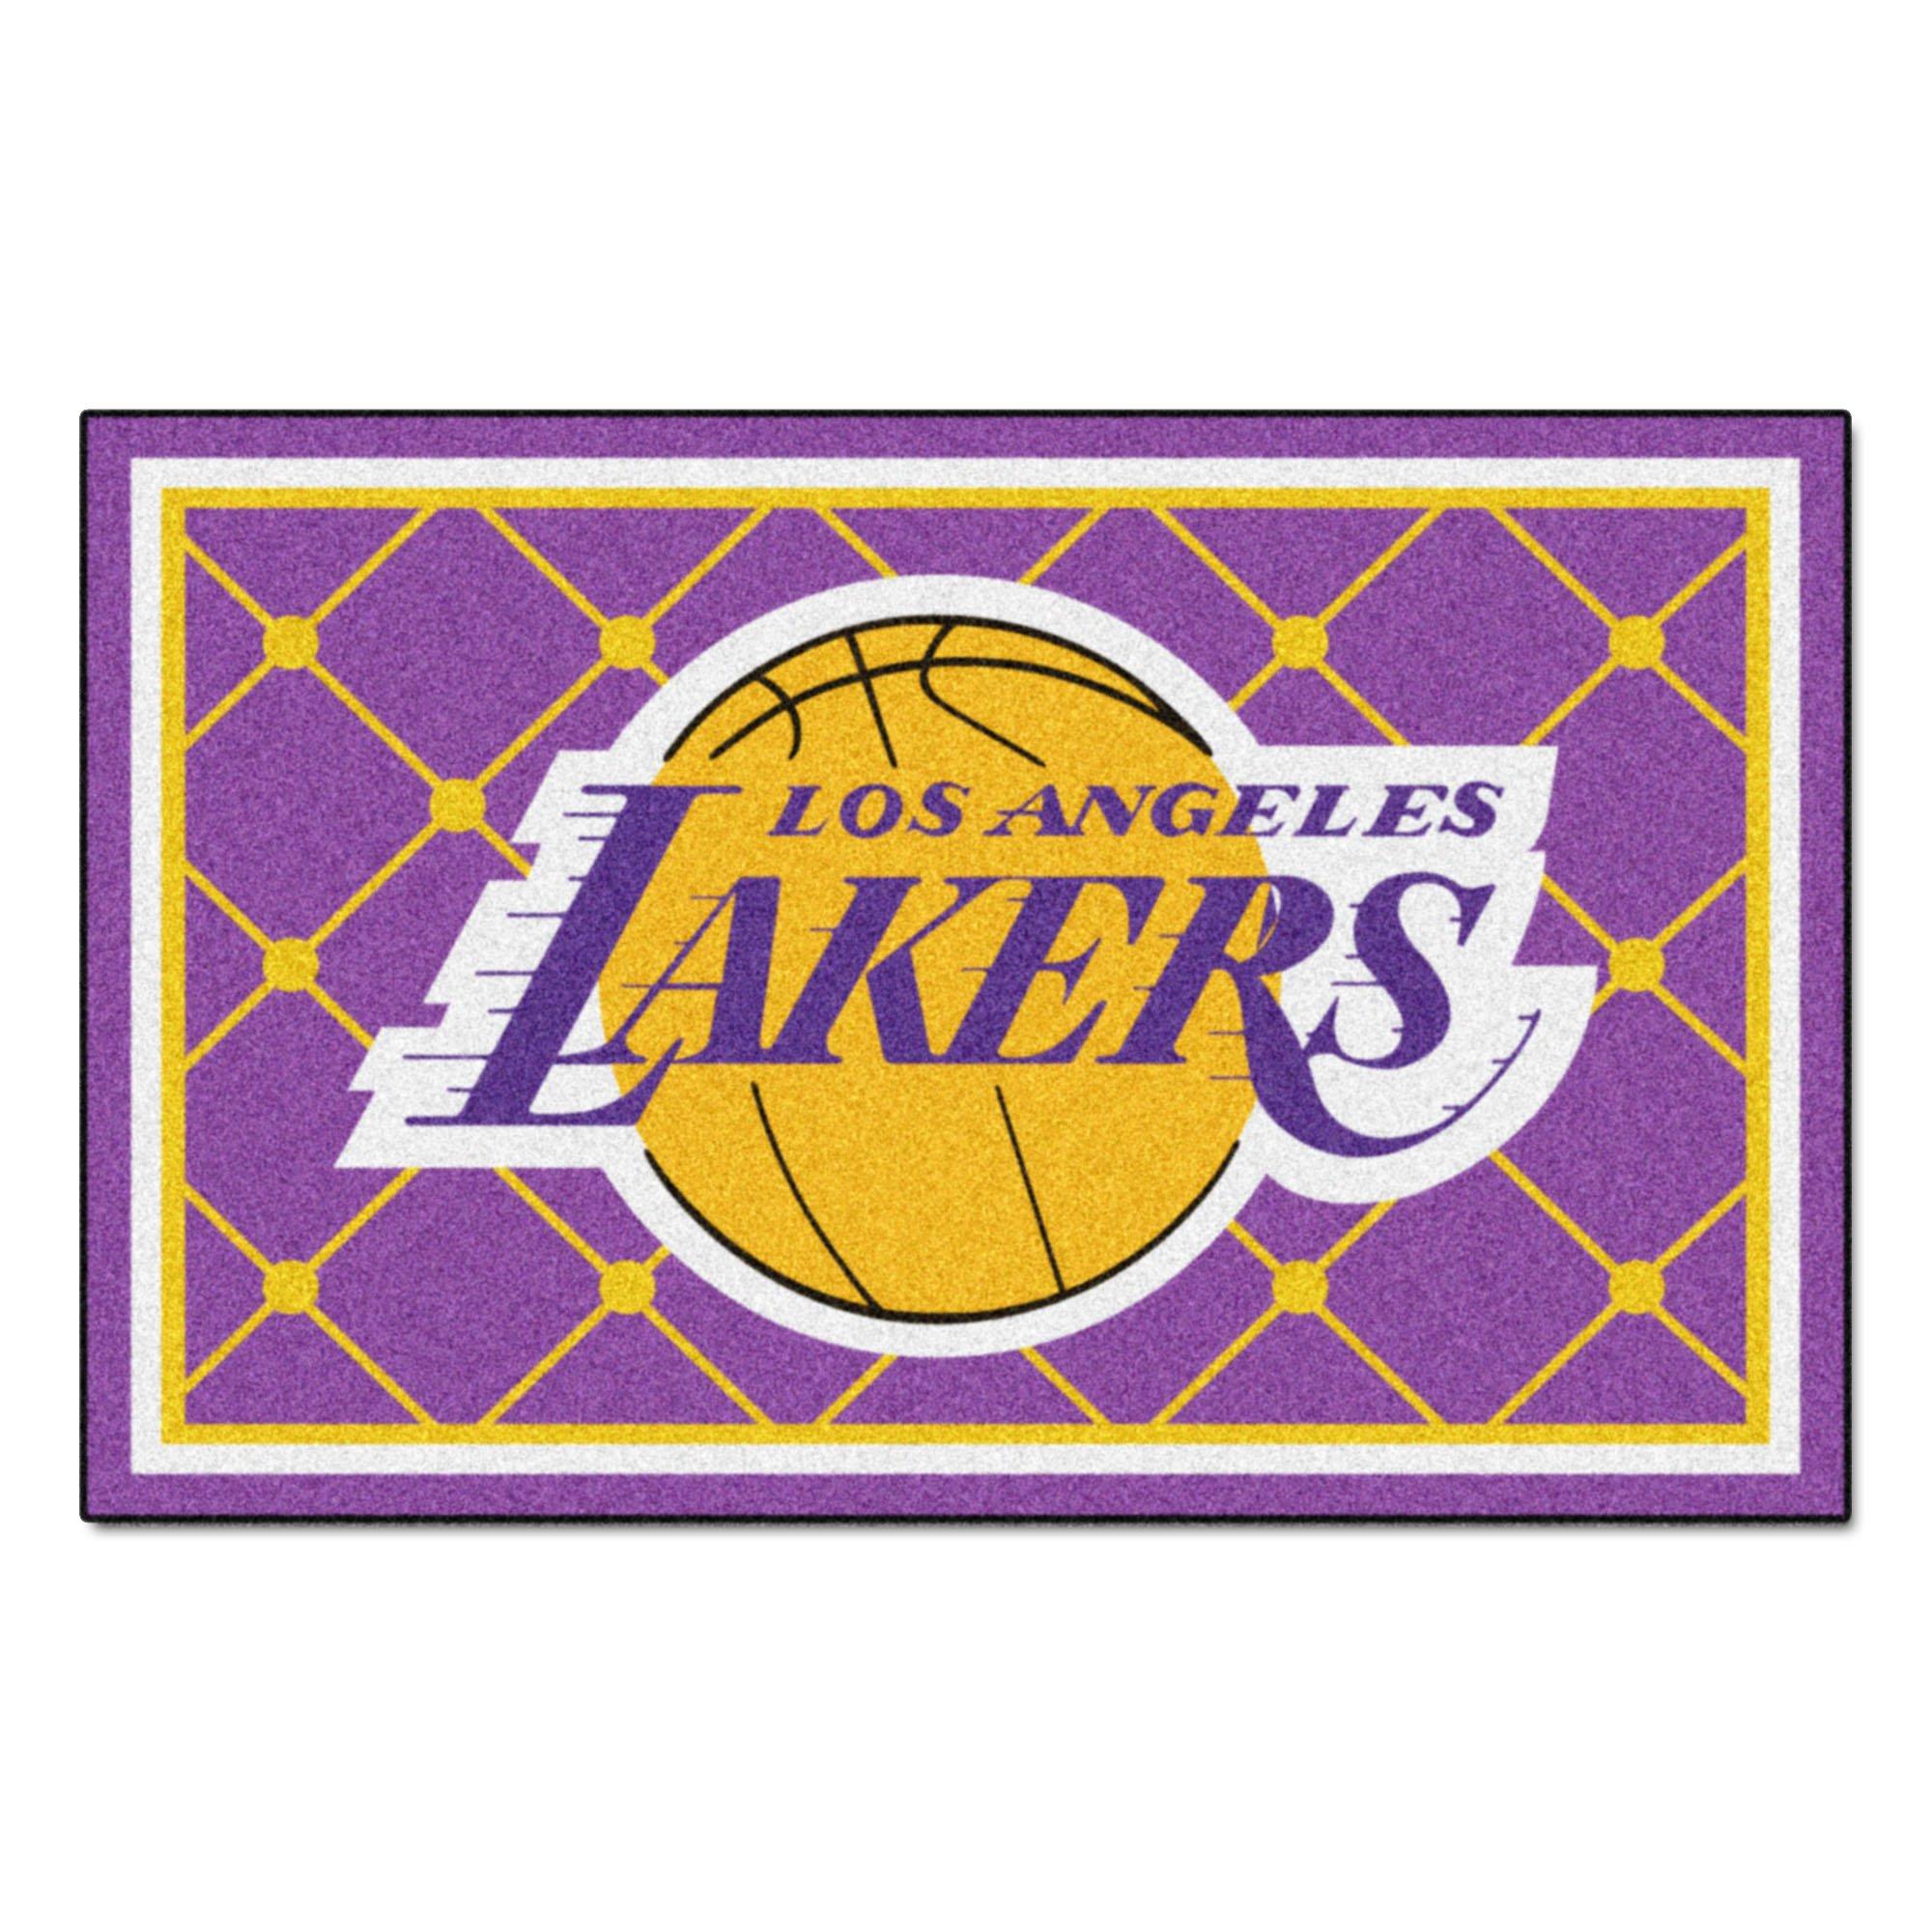 FANMATS NBA Los Angeles Lakers Nylon Face 5X8 Plush Rug